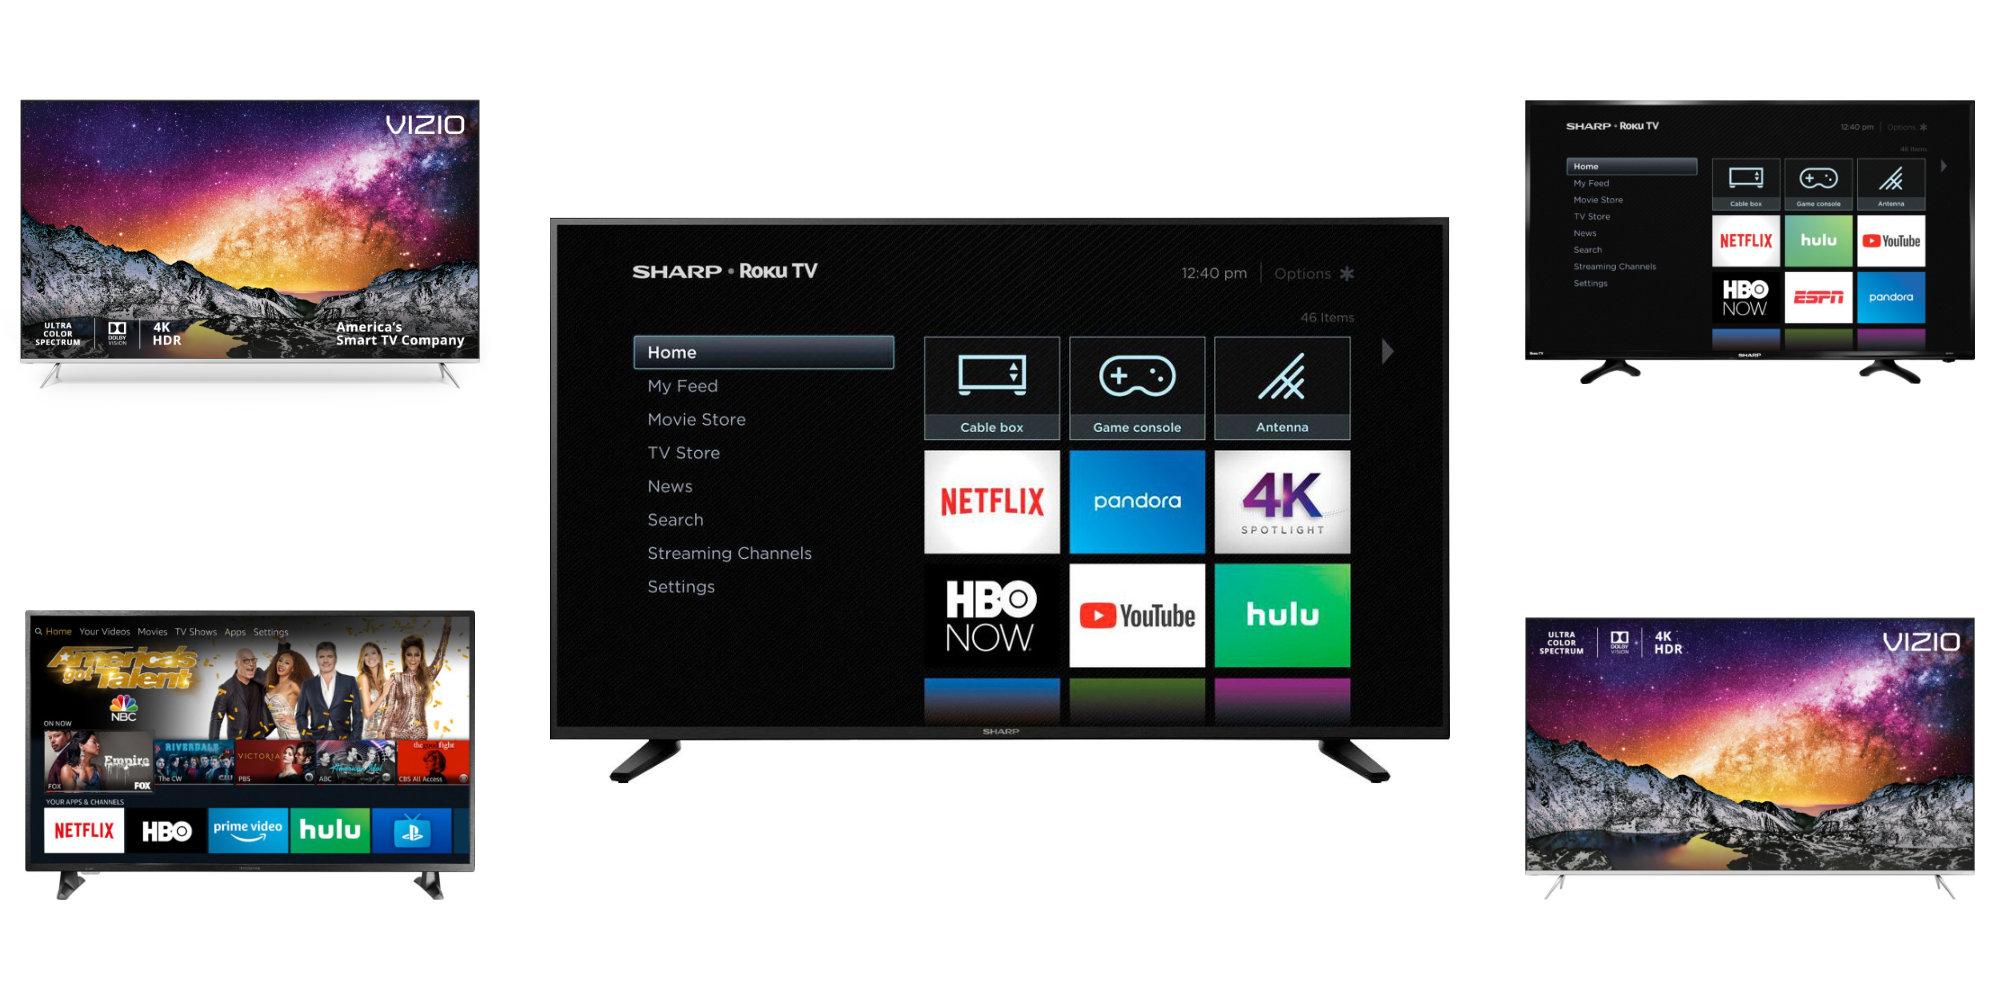 Today\u0027s best TV deals are Sharp\u0027s 58\u2033 4K at $350 (Reg. $550), Insignia 50\u2033 $280, more from $150 58\